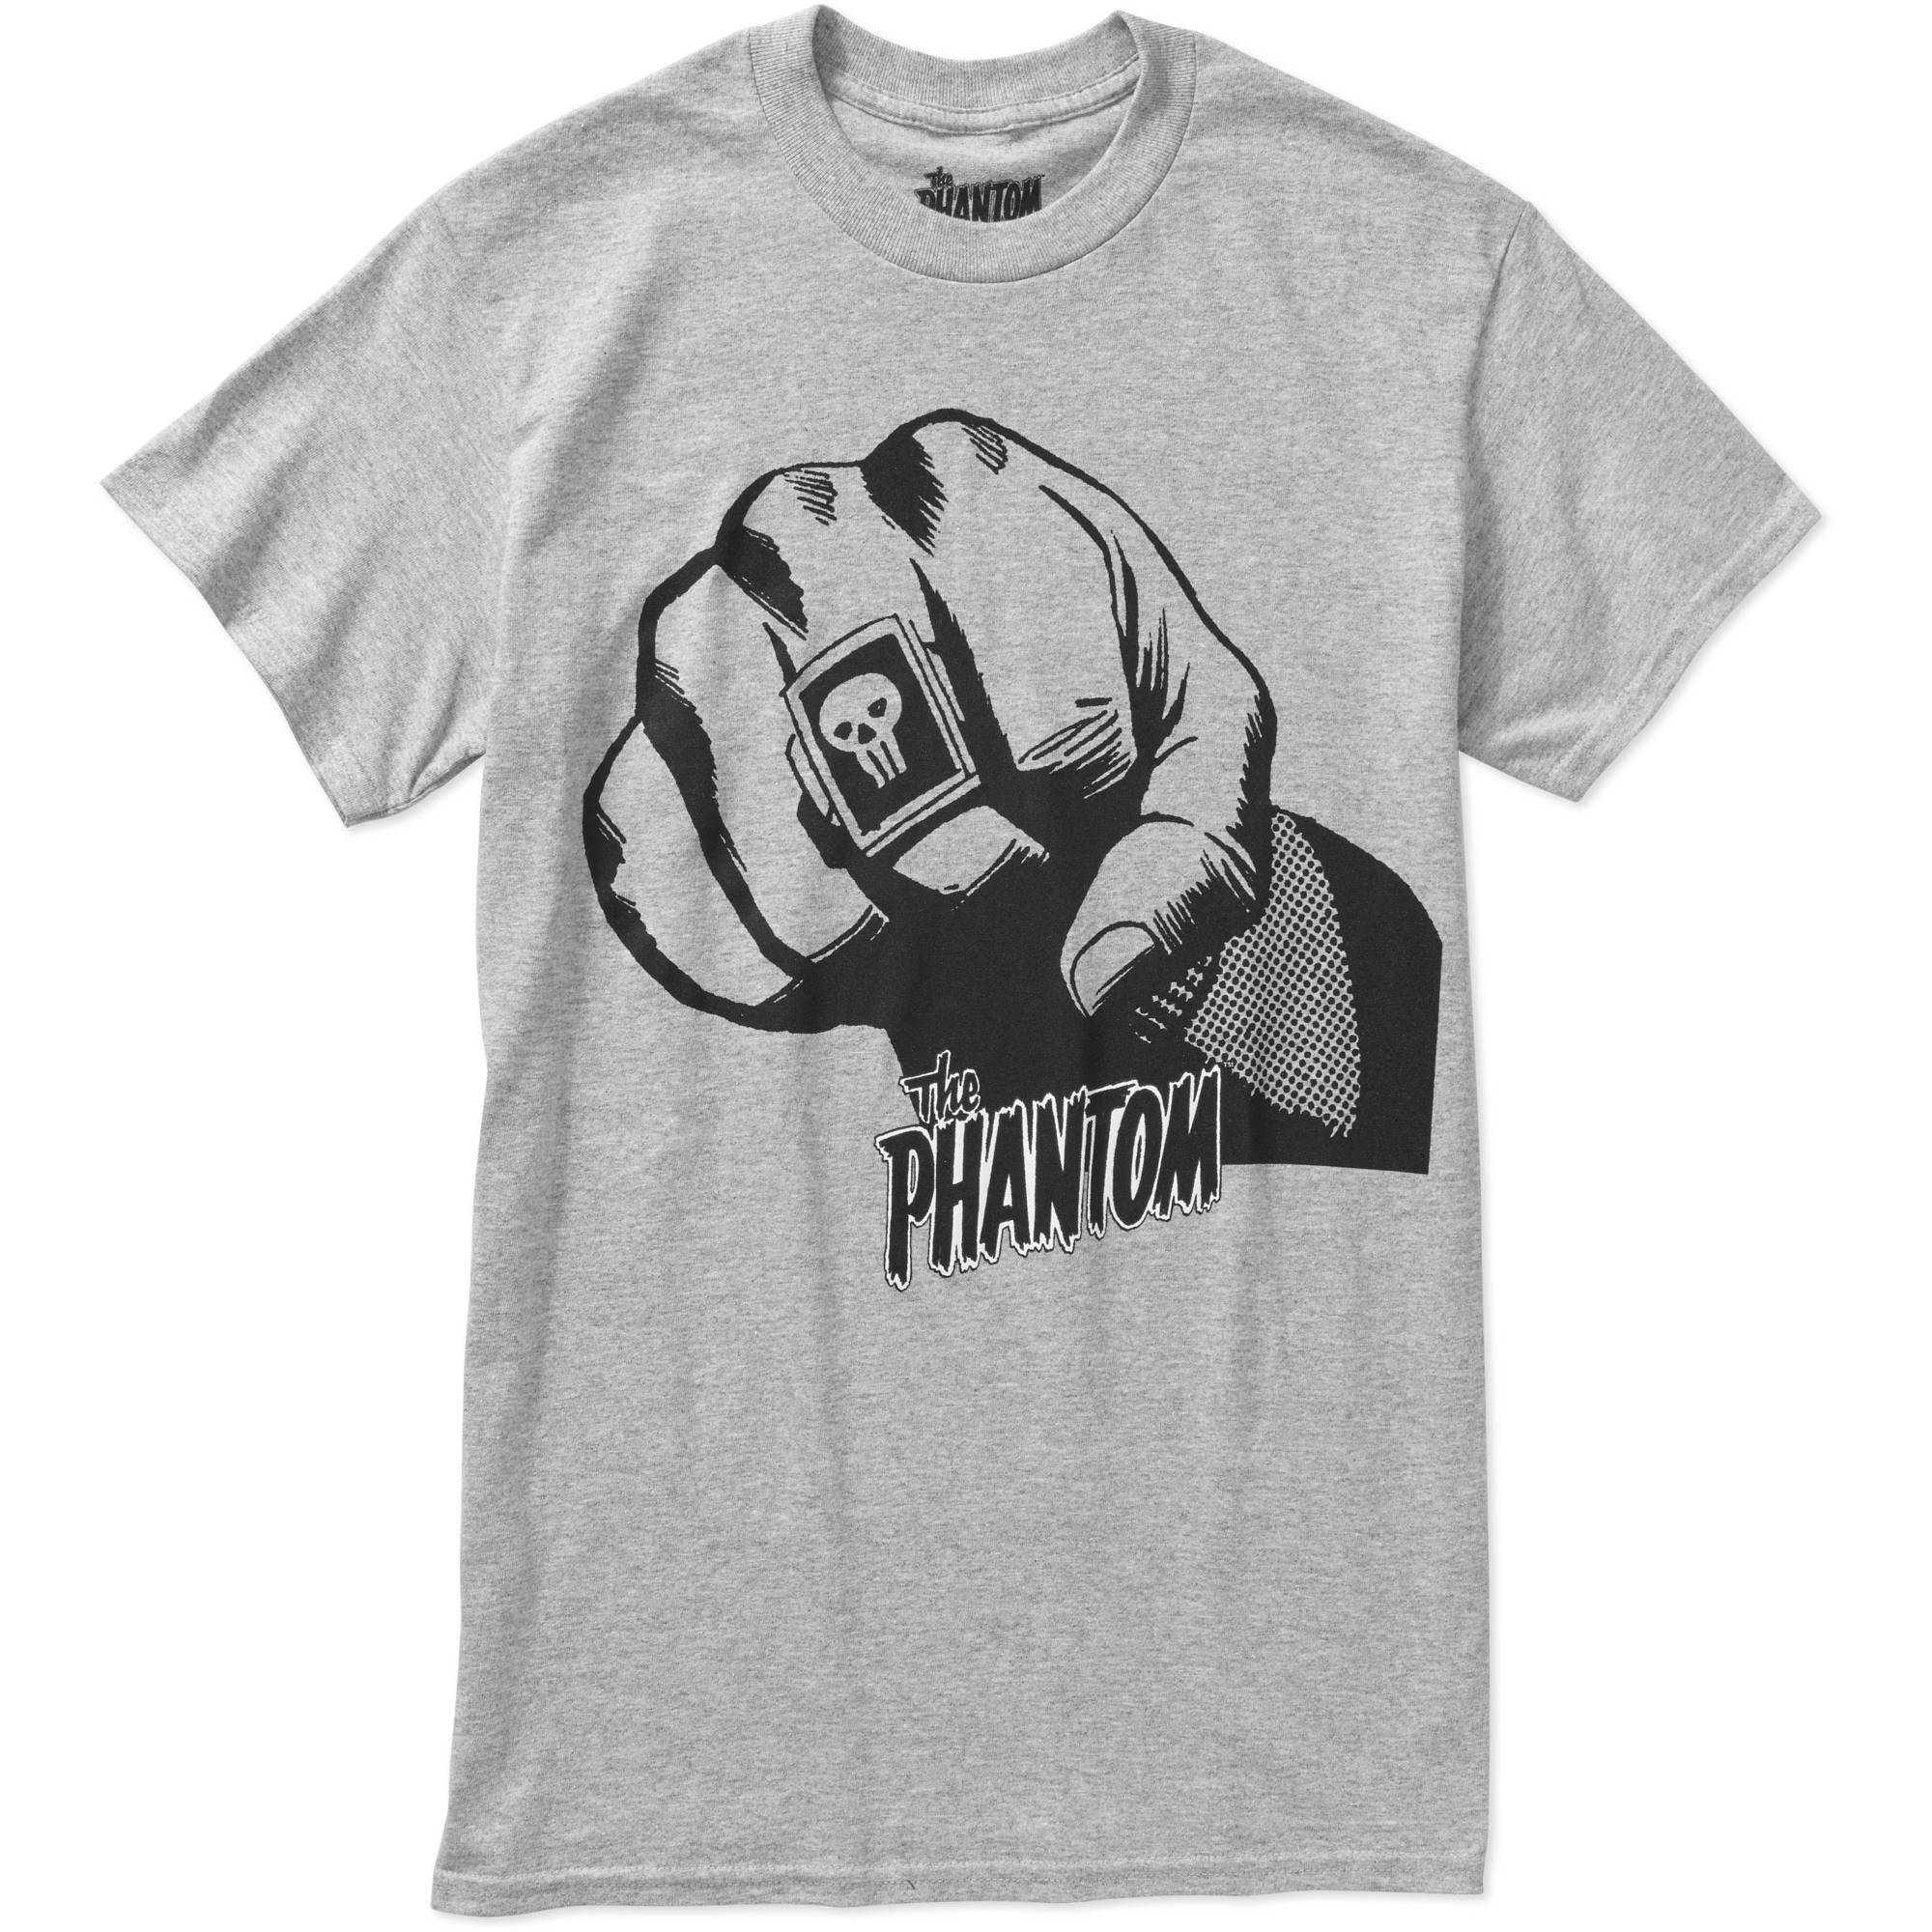 The Phantom Big Men's Graphic Tee, 2XL